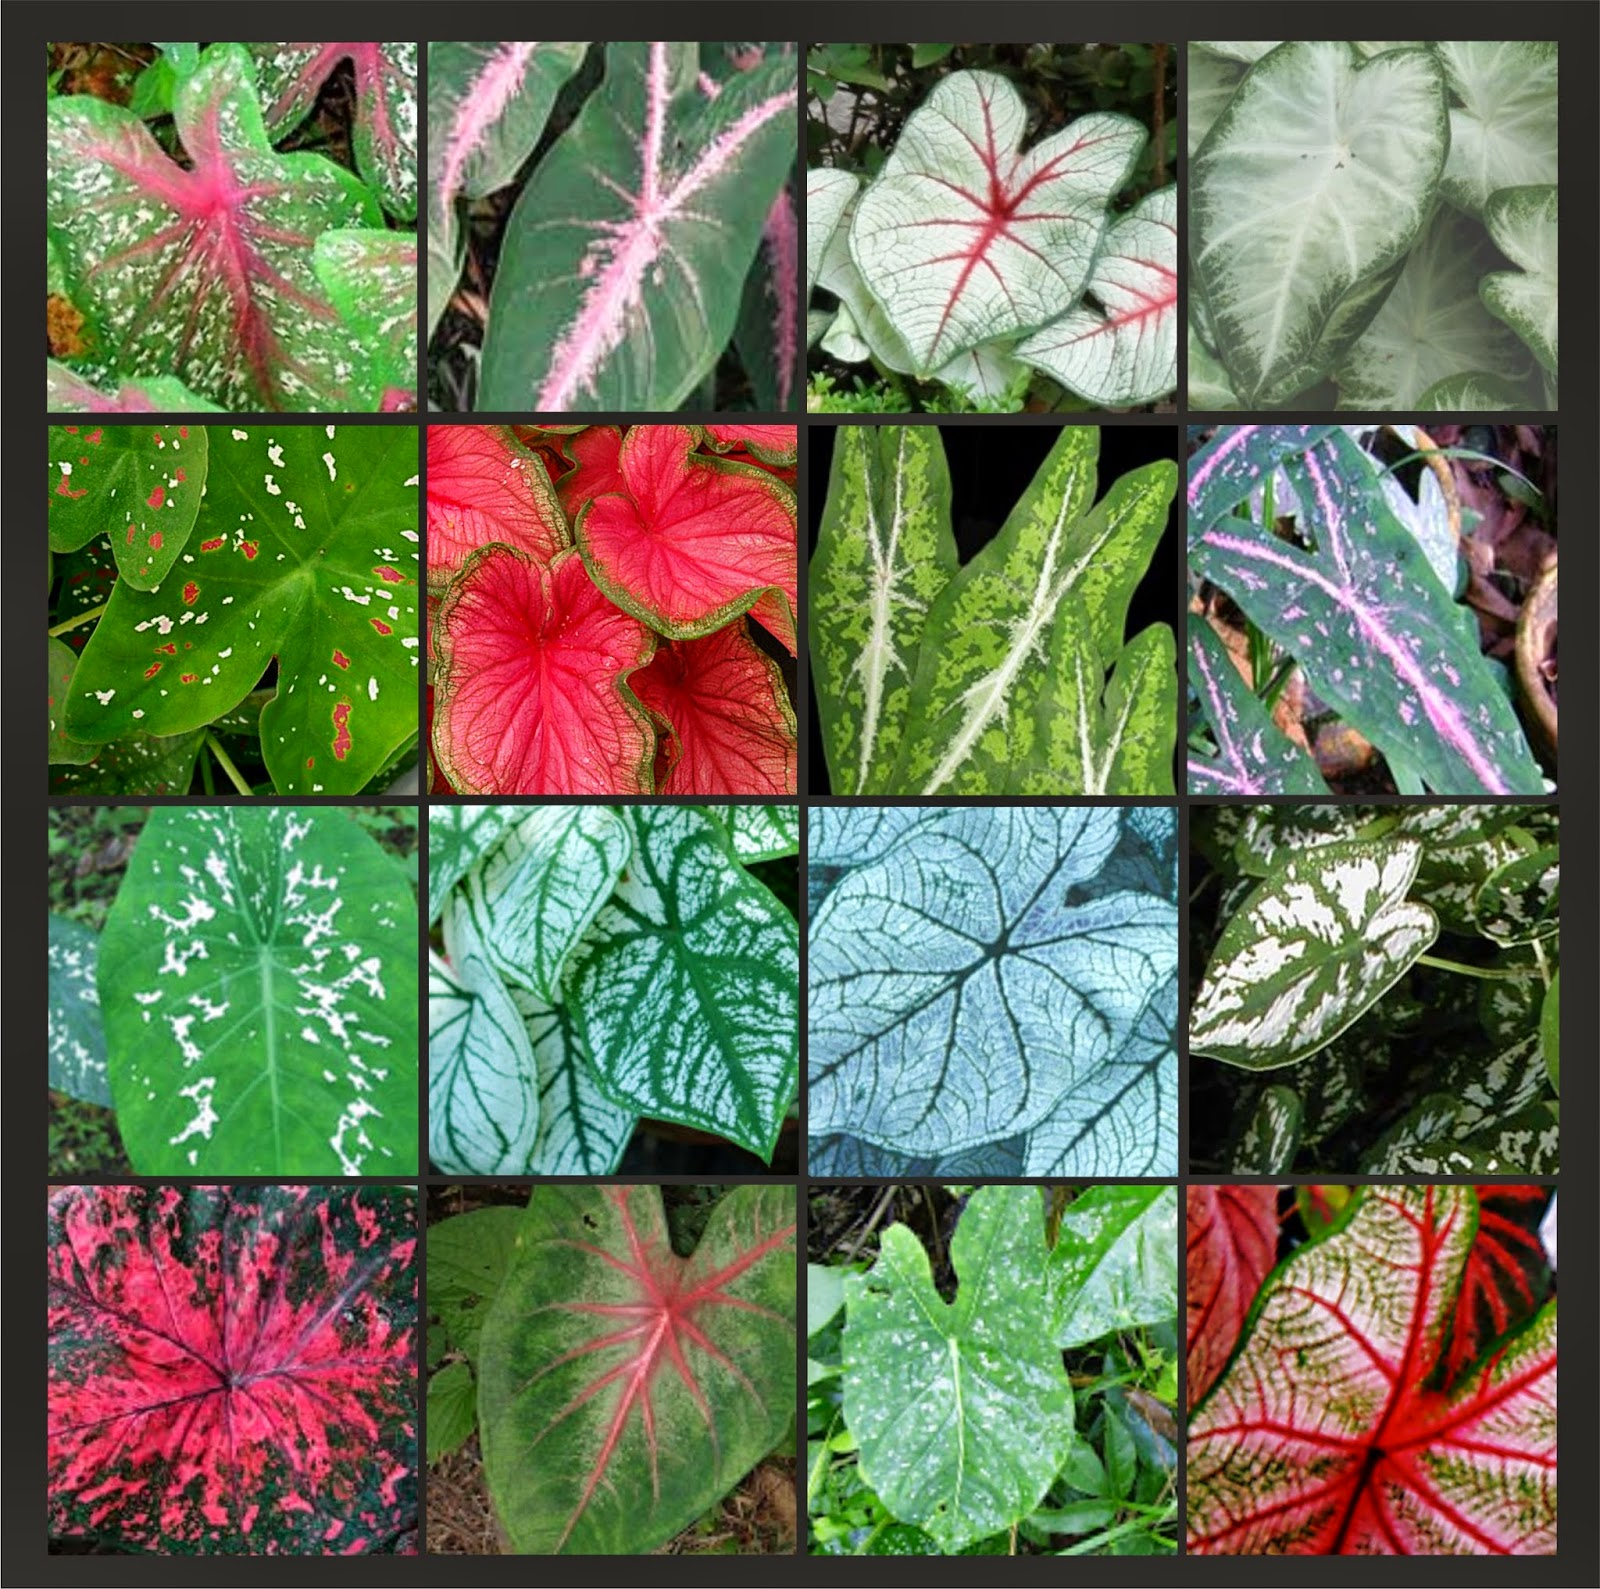 V e r d e c h a c o ornamentales en nuestros jardines 4 for Hojas ornamentales